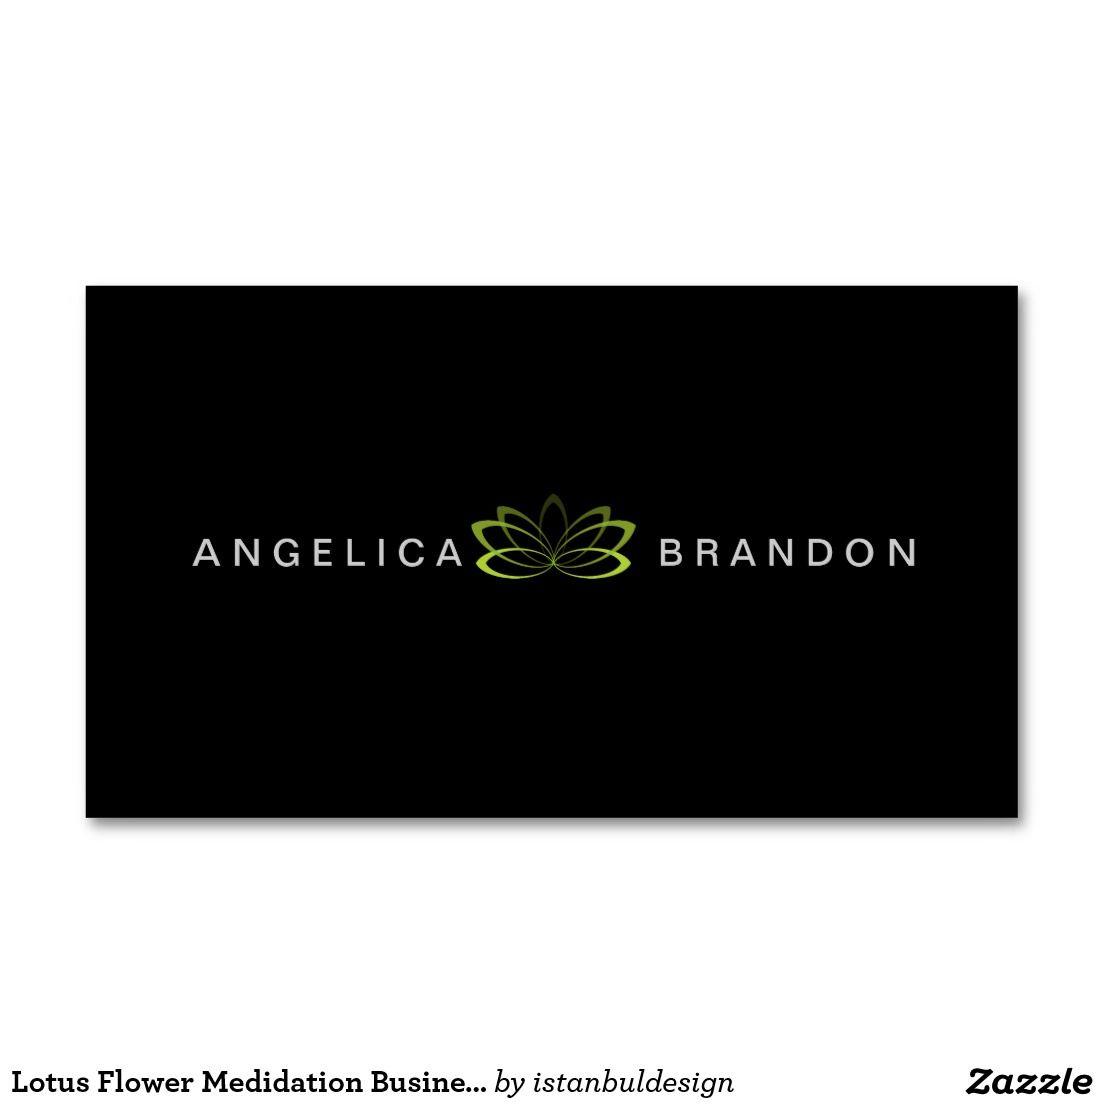 Lotus Flower Medidation Business Card | Meditation Business Cards ...